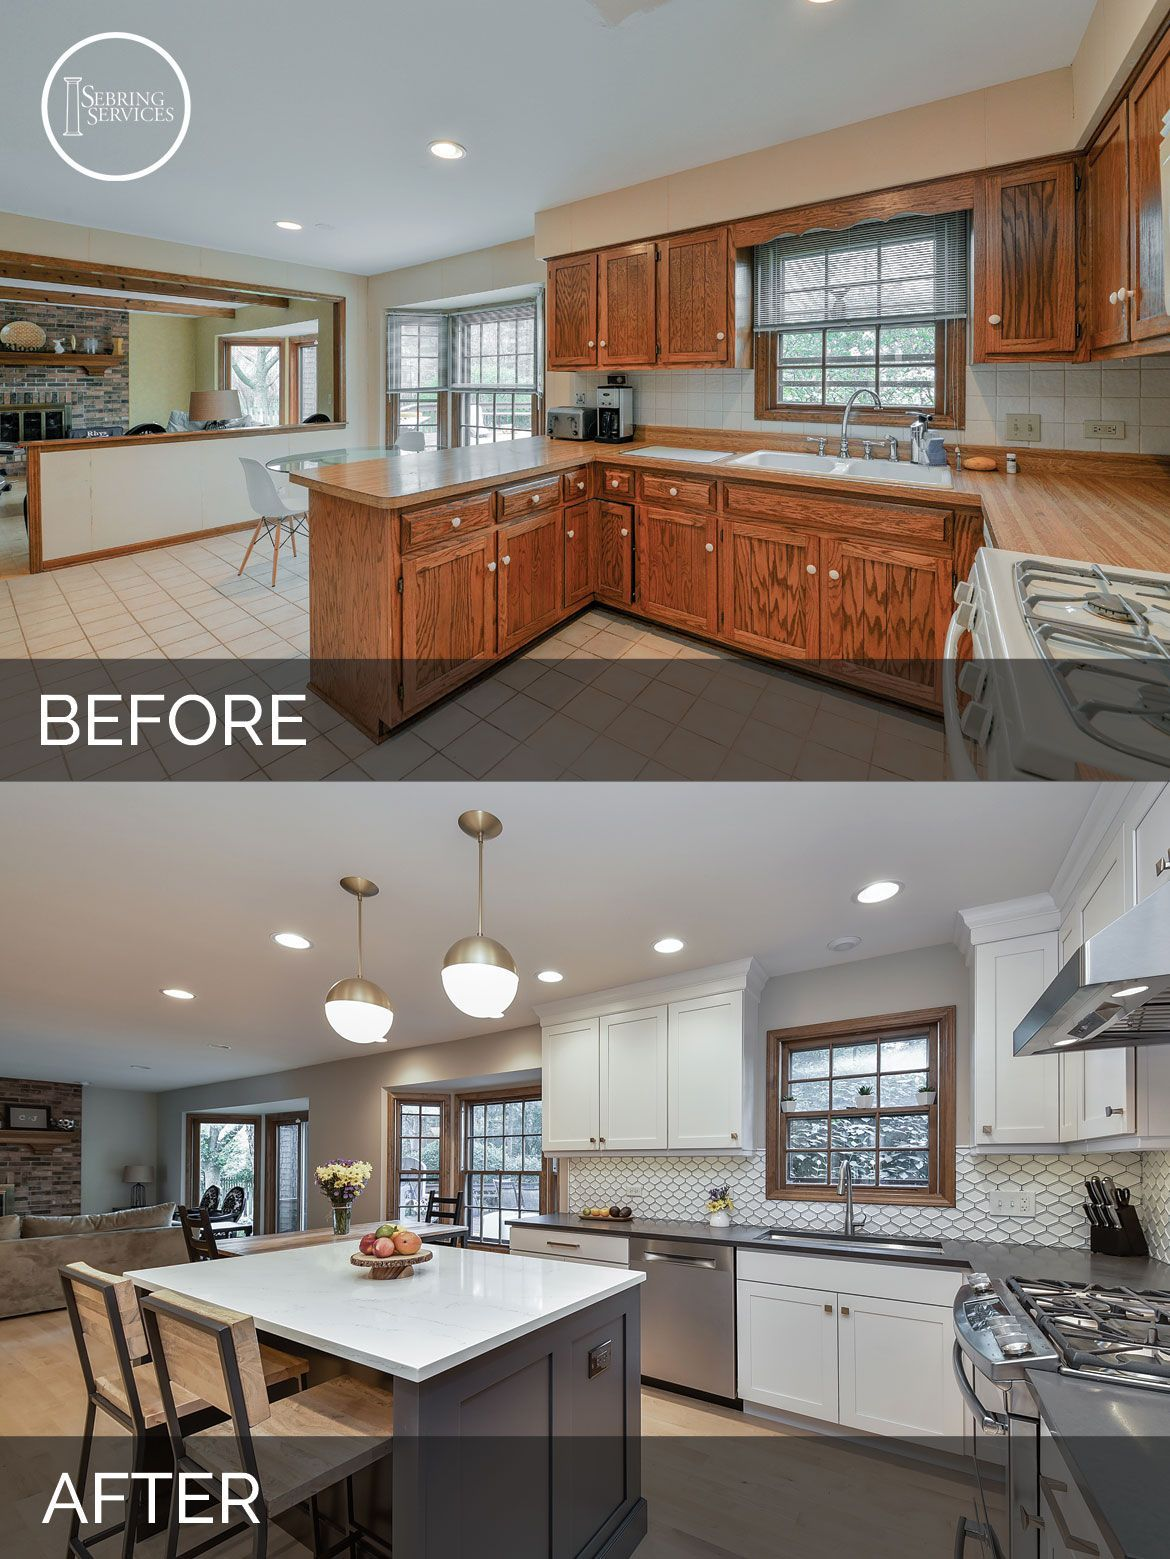 Justin & Carina's Kitchen Before & After  Home Remodeling Custom Bathroom Kitchen Remodeling Design Ideas